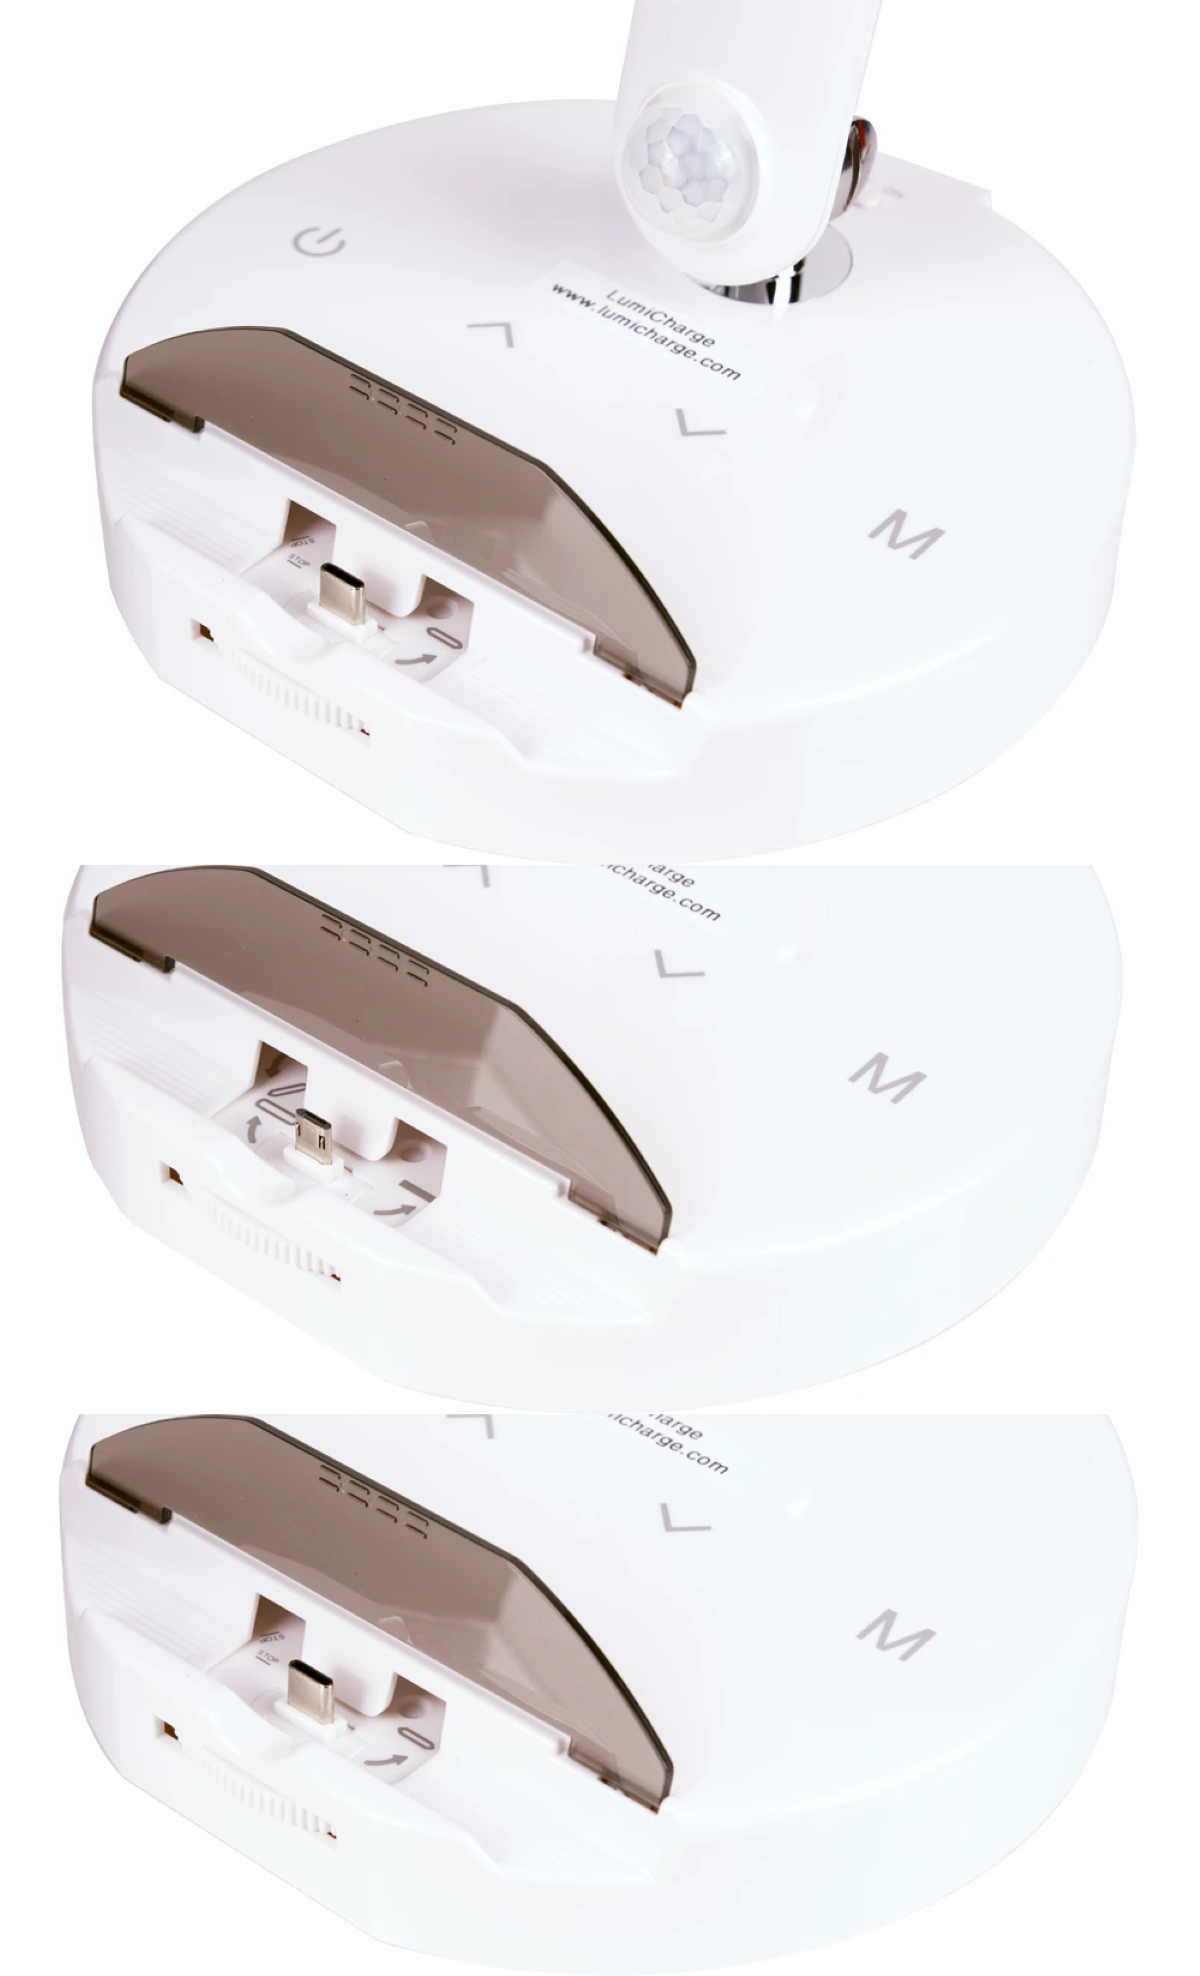 LED Lamp and Universal Phone Dock - Smartphone Charging Dock (1)